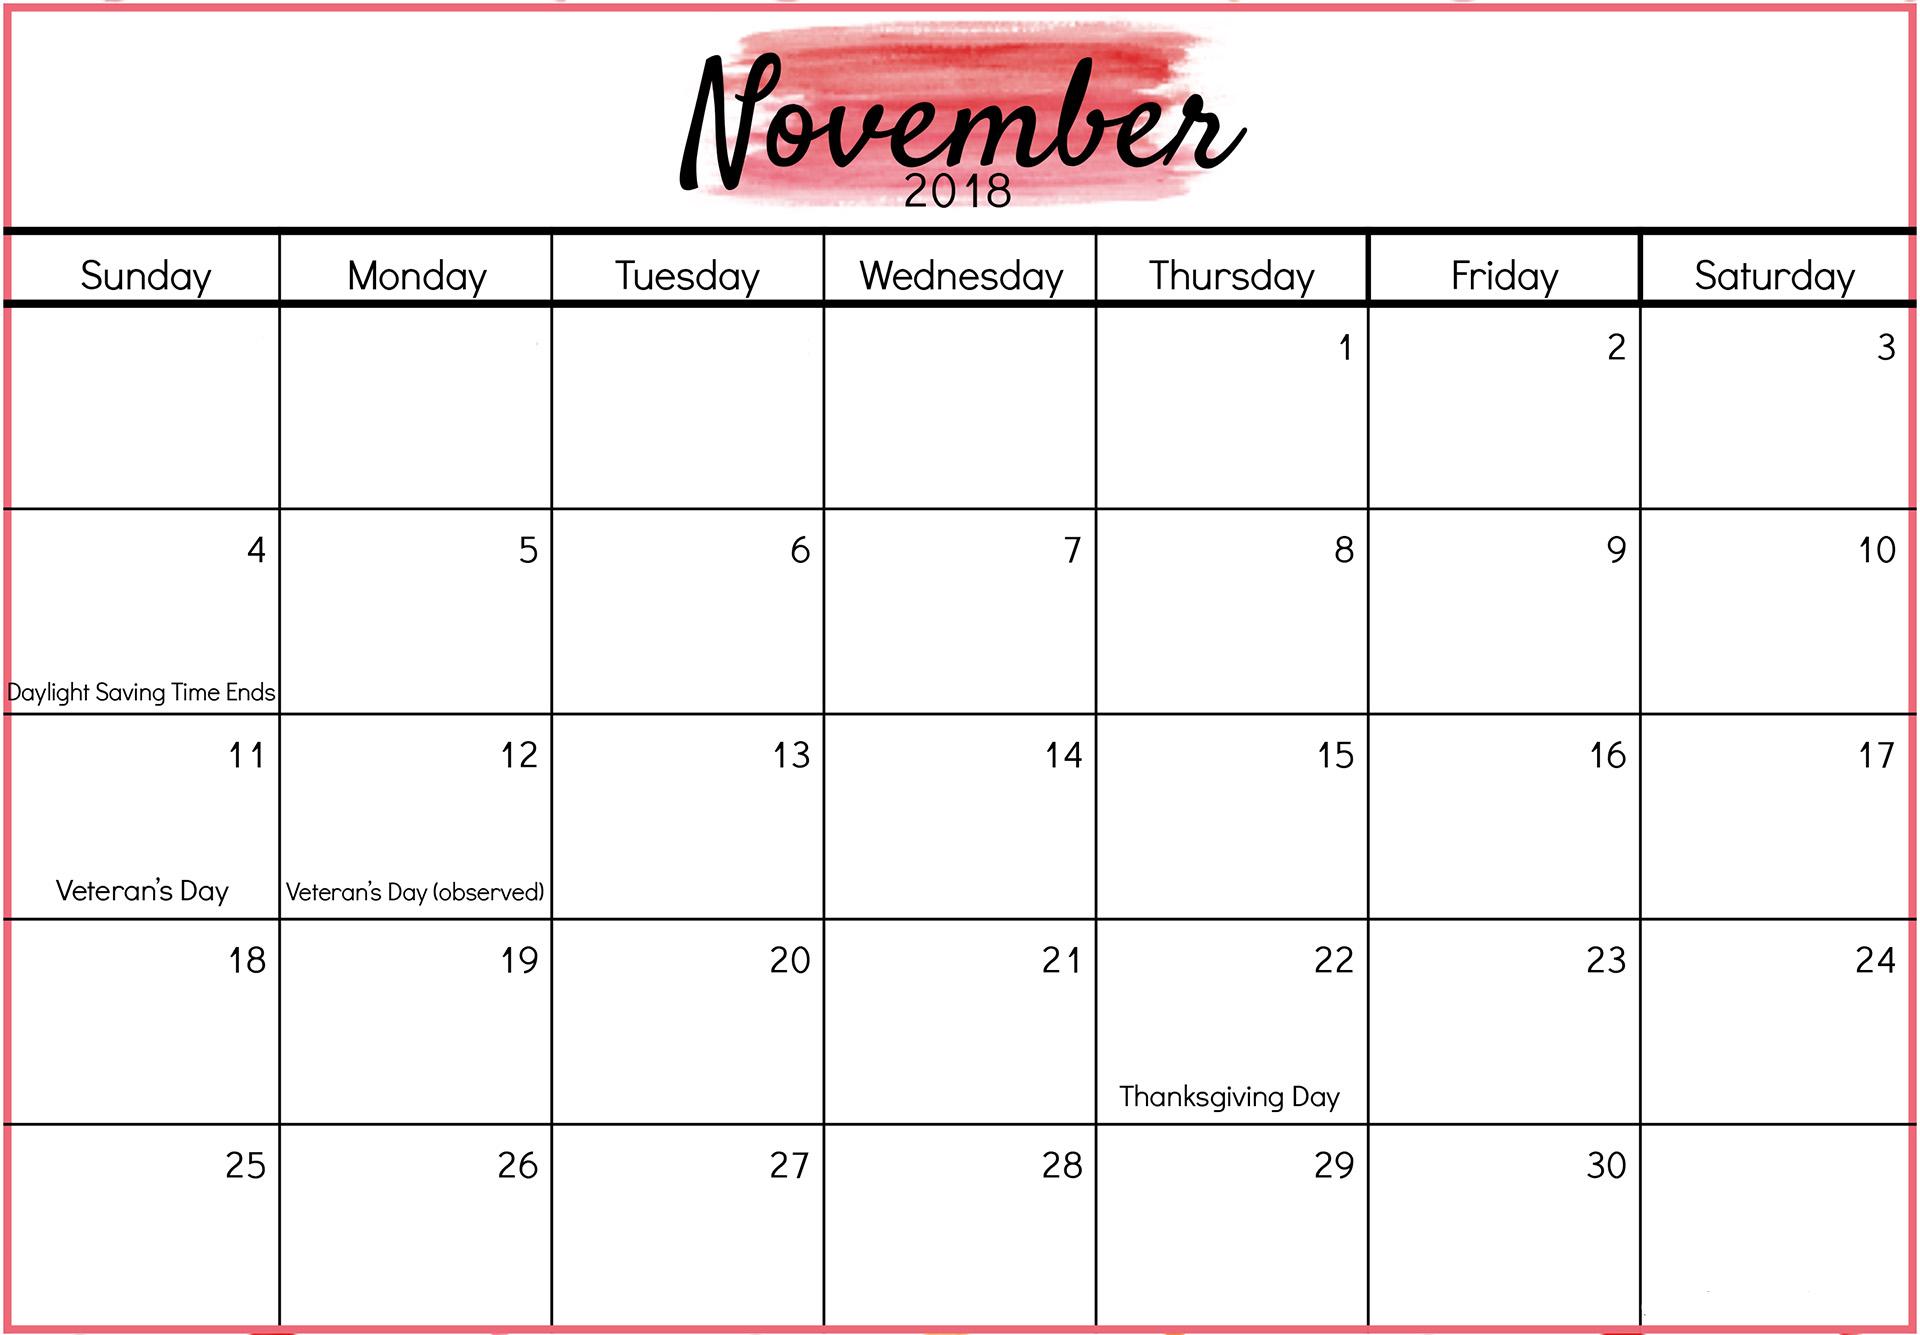 November 2018 Calendar Printable - Fresh Calendars inside November Calendar Templates Editable